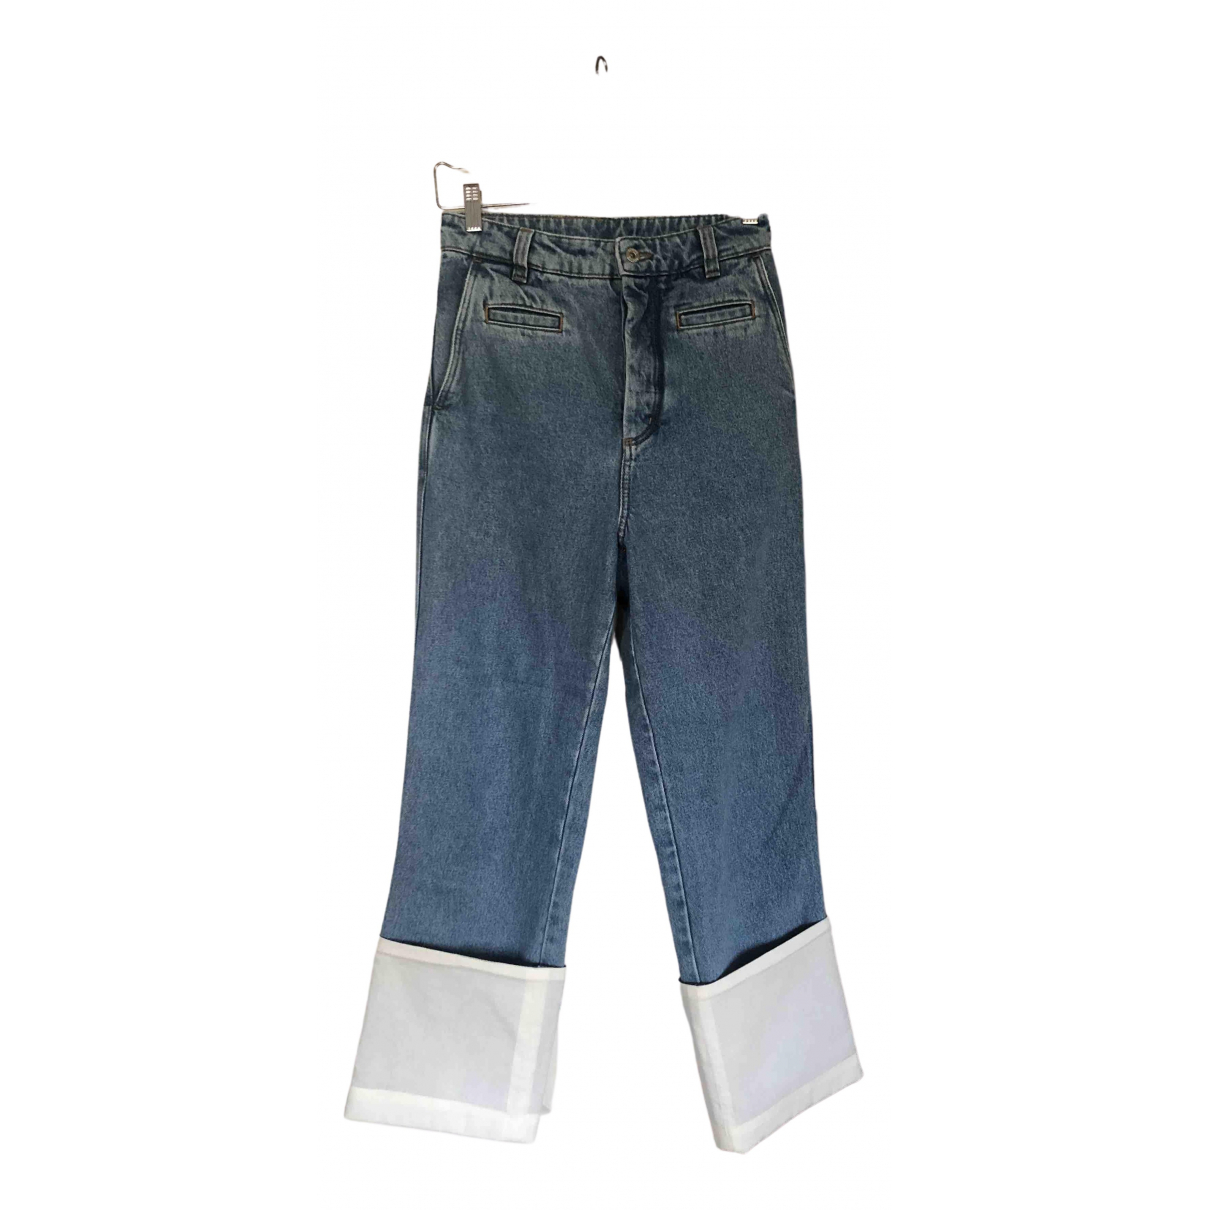 Loewe \N Blue Cotton Jeans for Men 27 US